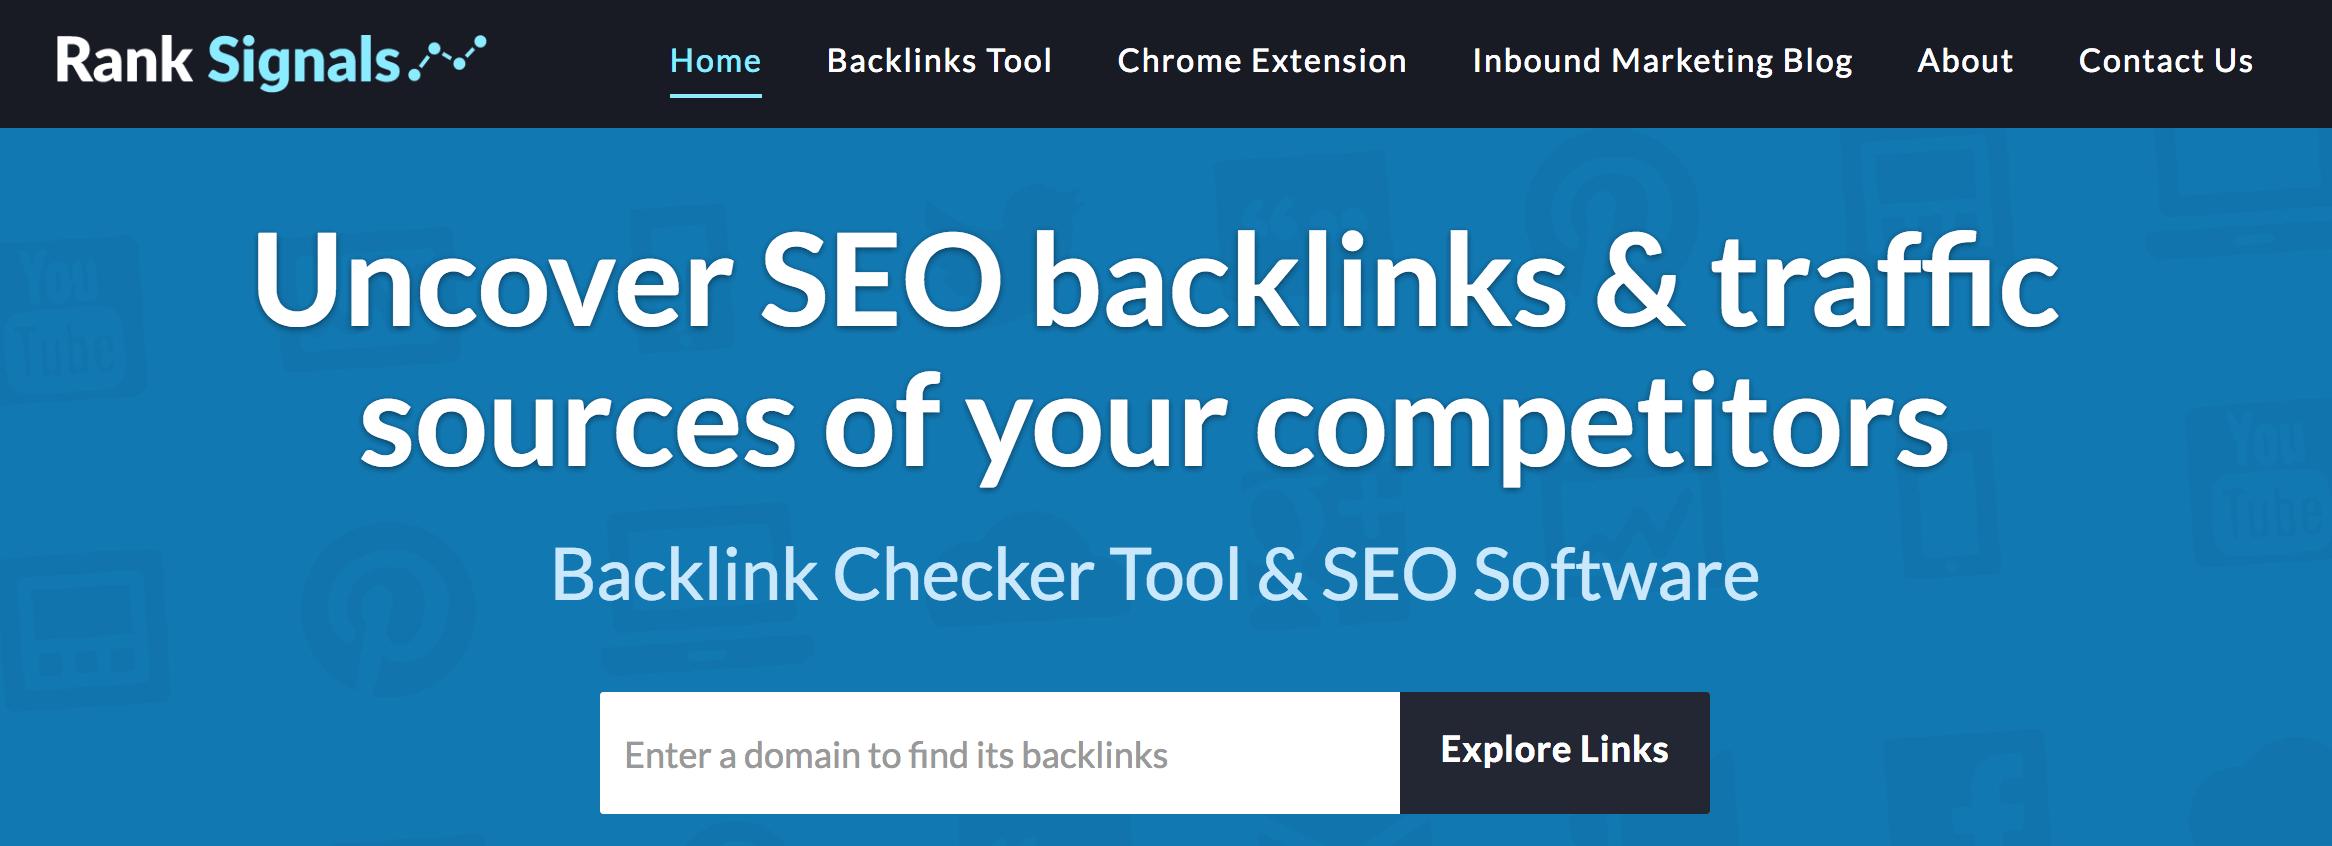 ranksignals competitor analysis tools